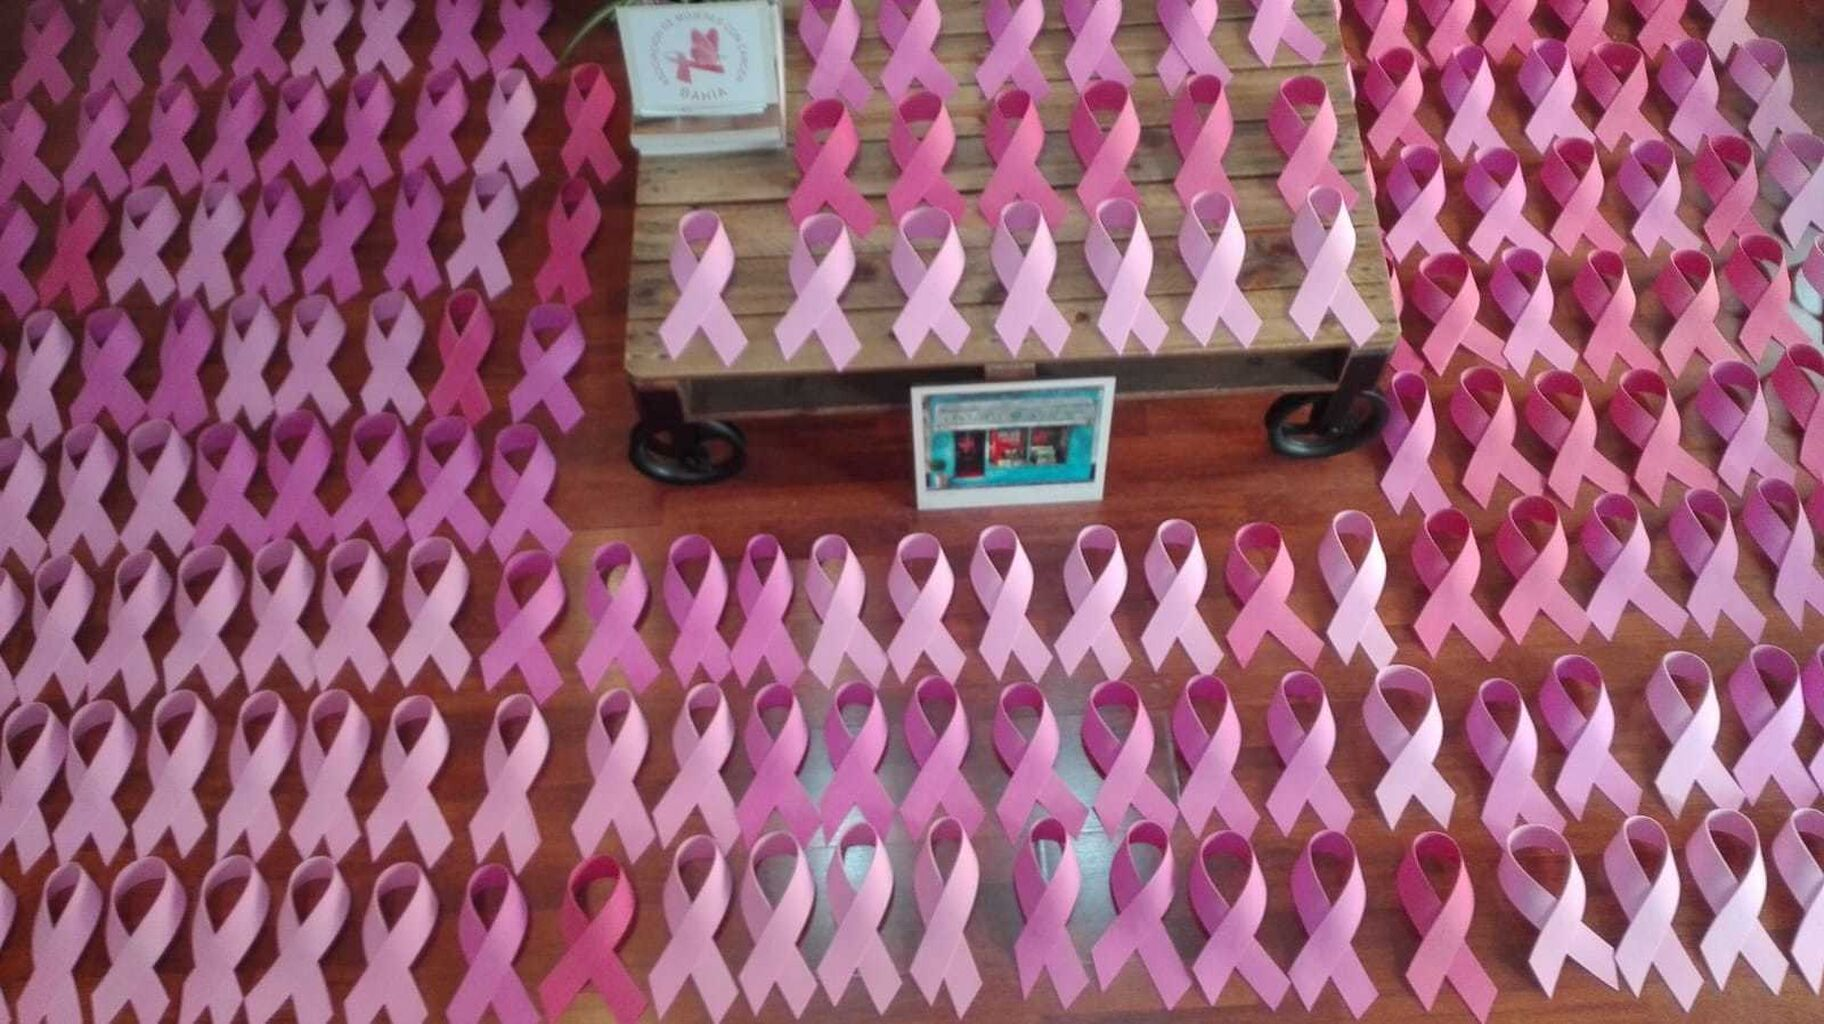 Imagenes Lazos Rosas Cancer.Dia Mundial Del Cancer De Mama El Puerto Se Vestira De Rosa